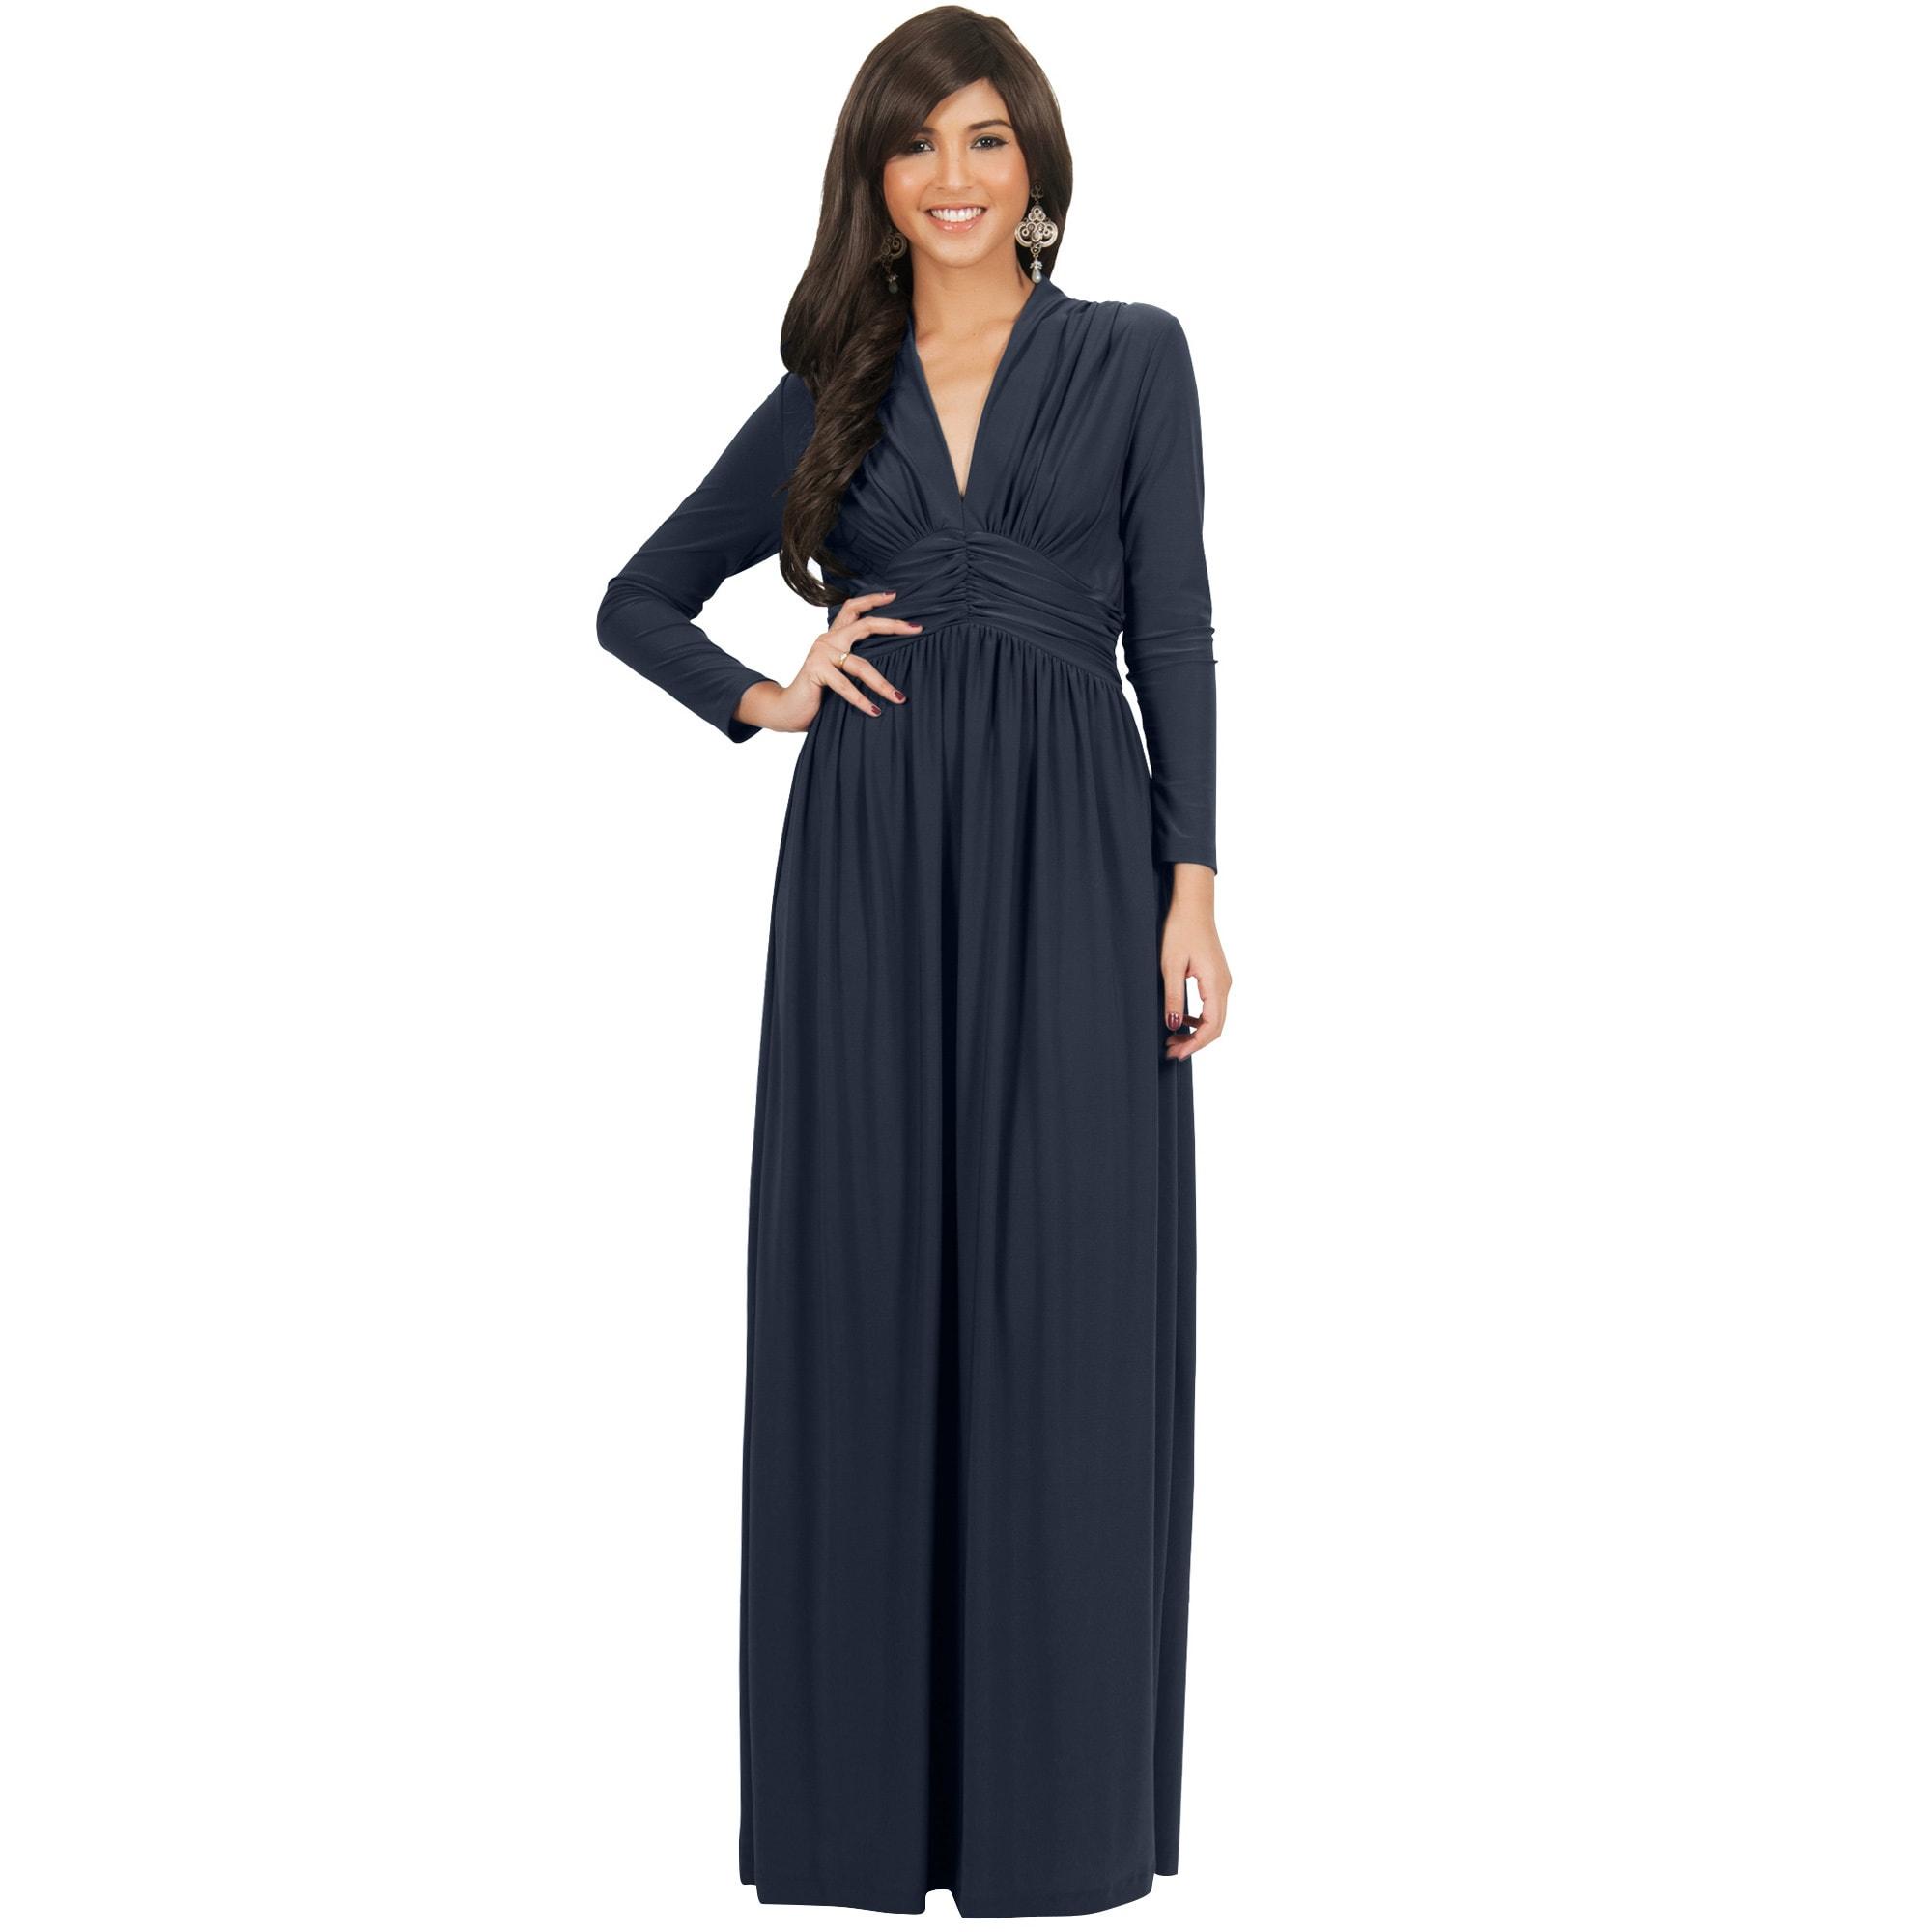 ed02124e95e0 Shop KOH KOH Women s Vintage Inspired V-neck Long Sleeve Maxi Dress - Free  Shipping Today - Overstock - 10835718